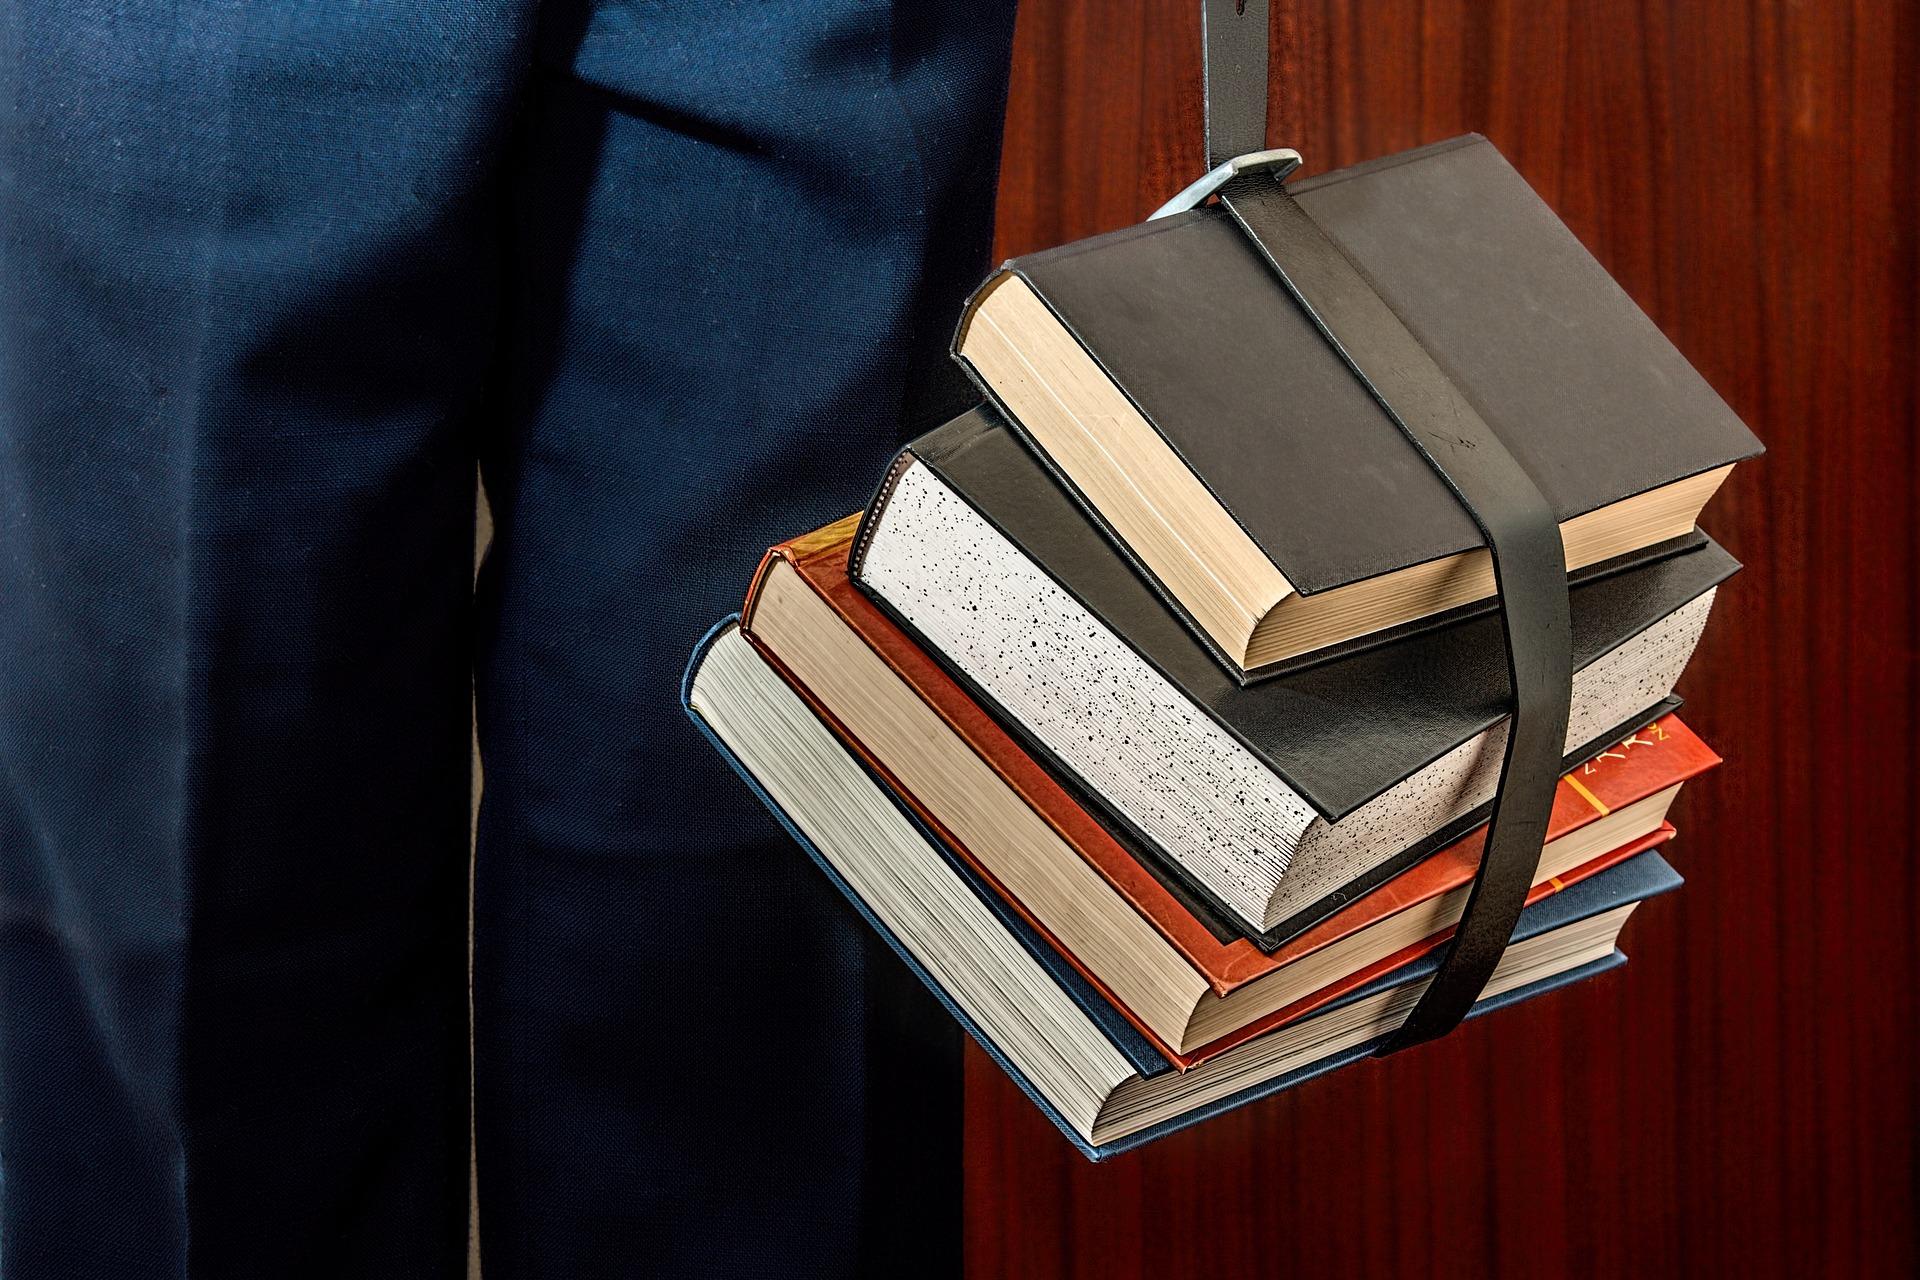 Parhat kirjat lahjaksi miehelle